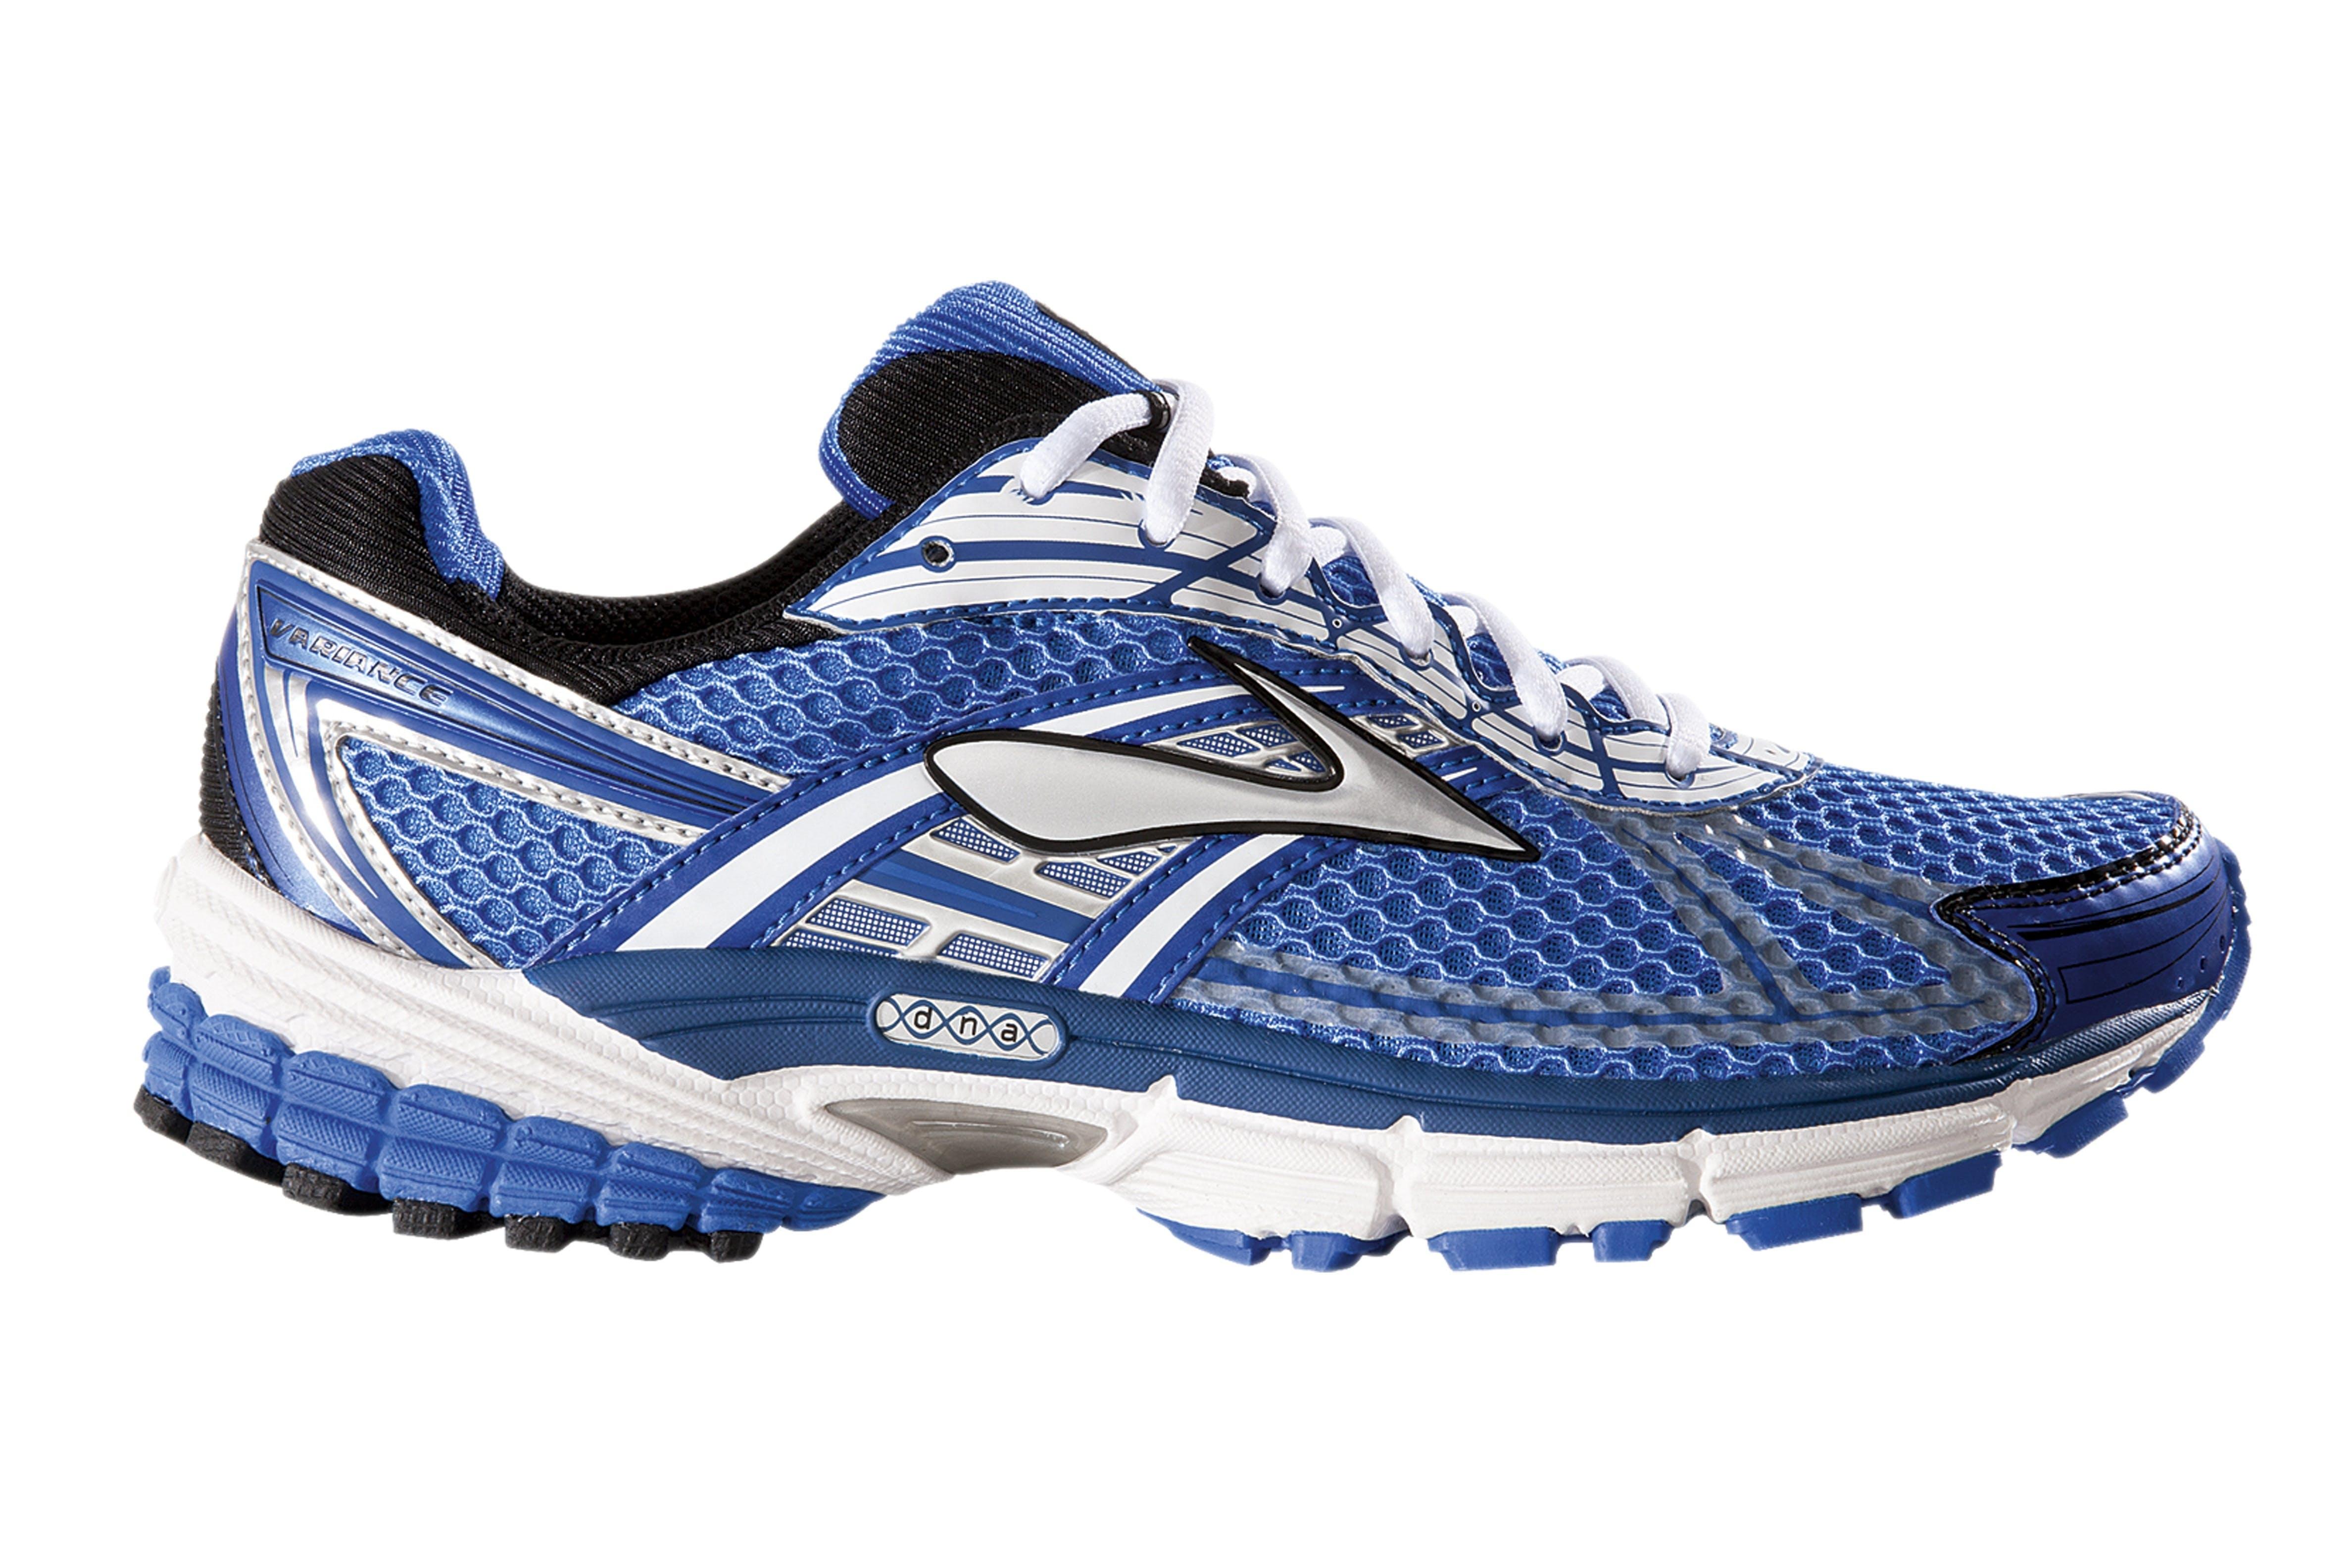 Fotos de stock gratuitas de calzado, zapatillas, zapato